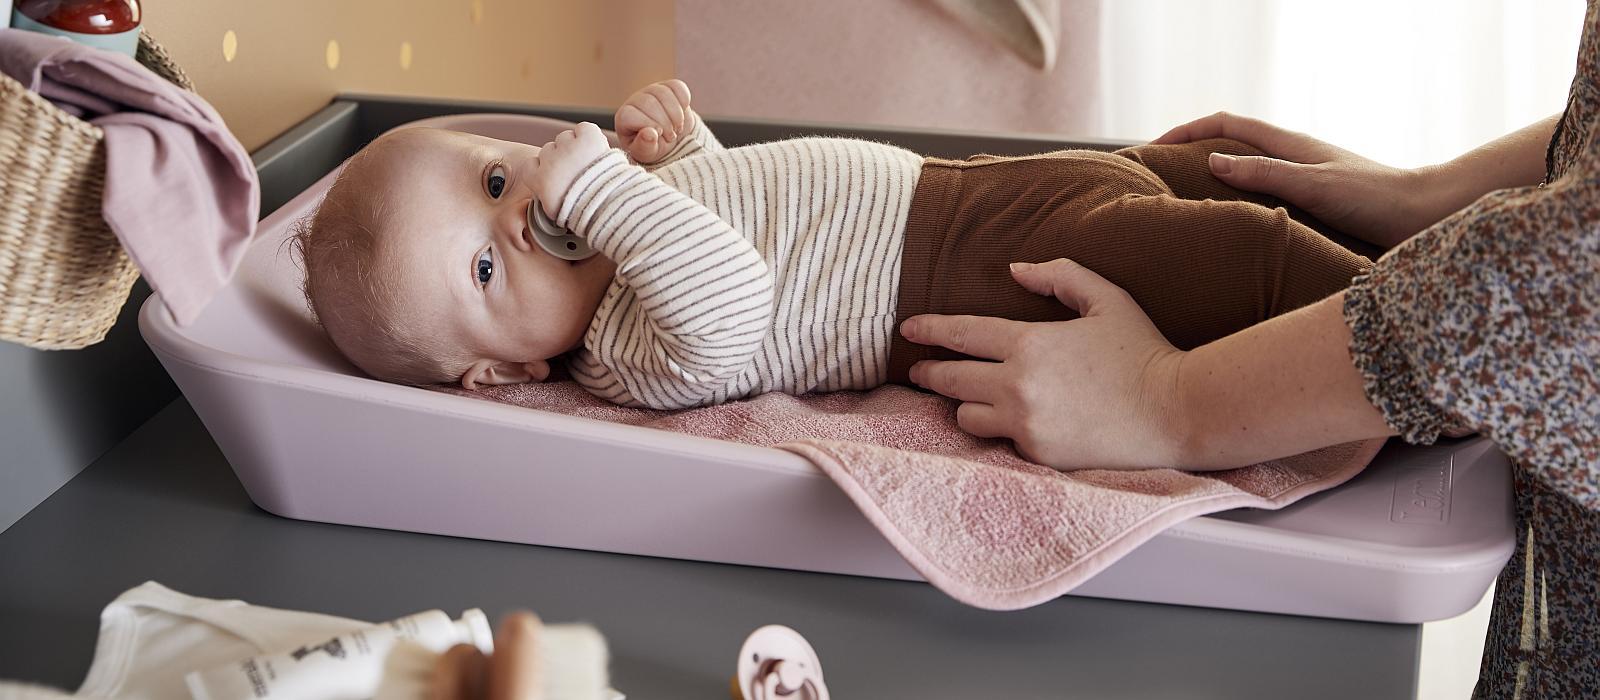 Baby girl on pink Leander Matty mat